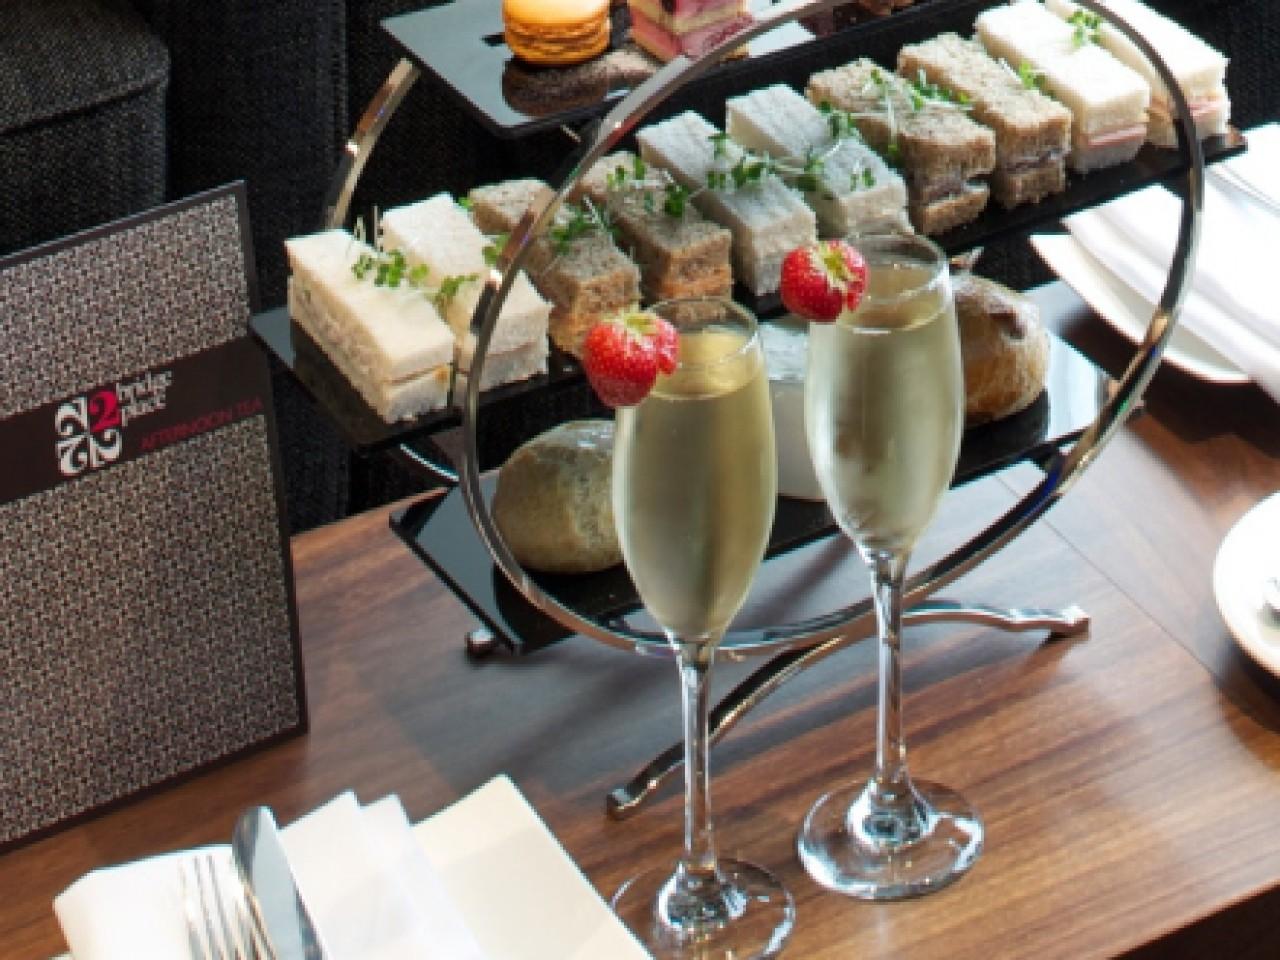 London Hotel & Afternoon Tea